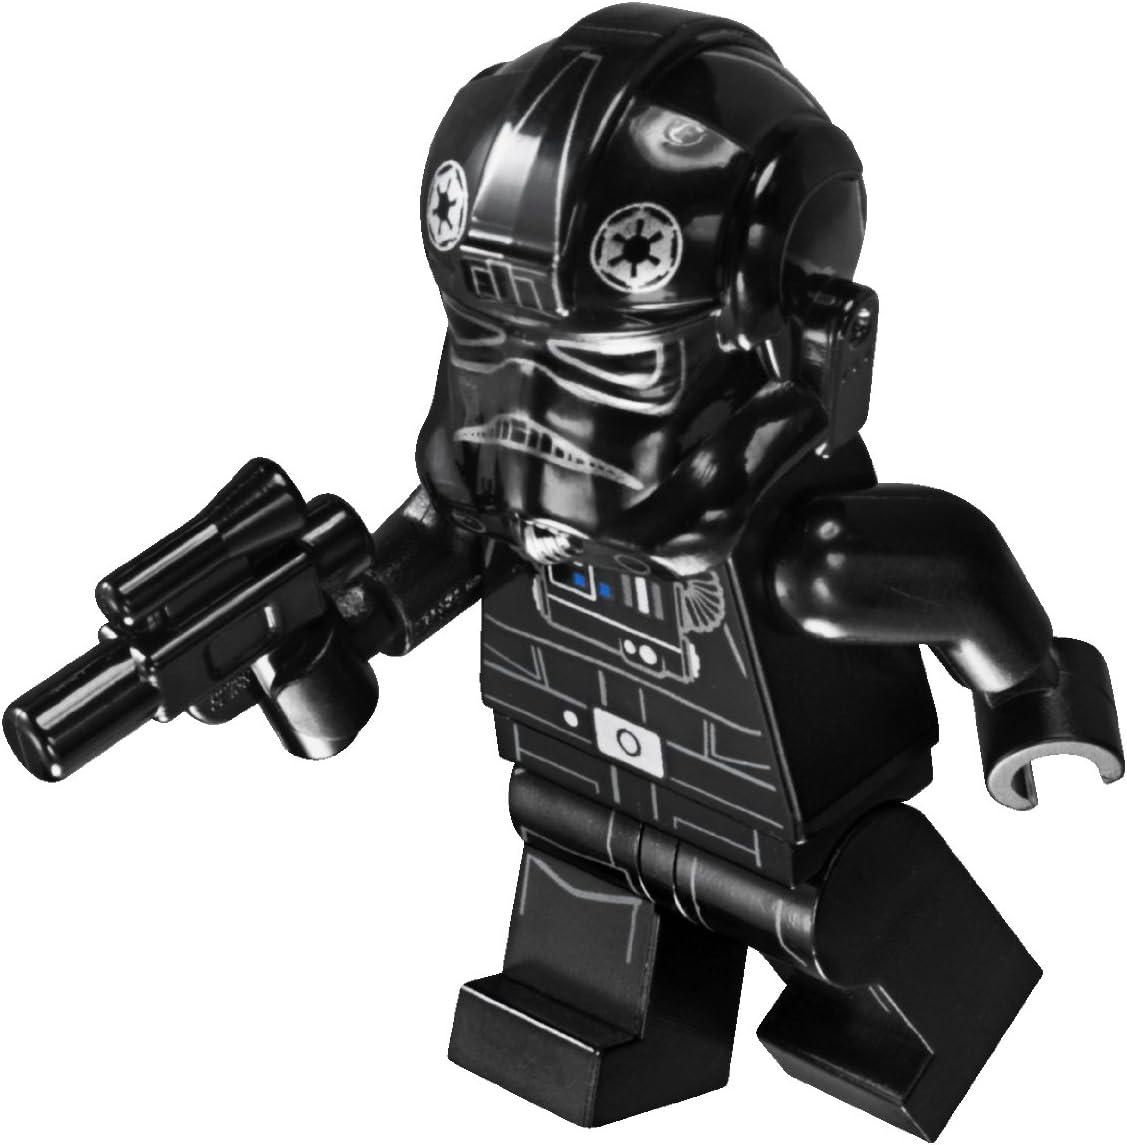 Lego Star Wars Tie Fighter Pilot sw0543 from set 75056 75031